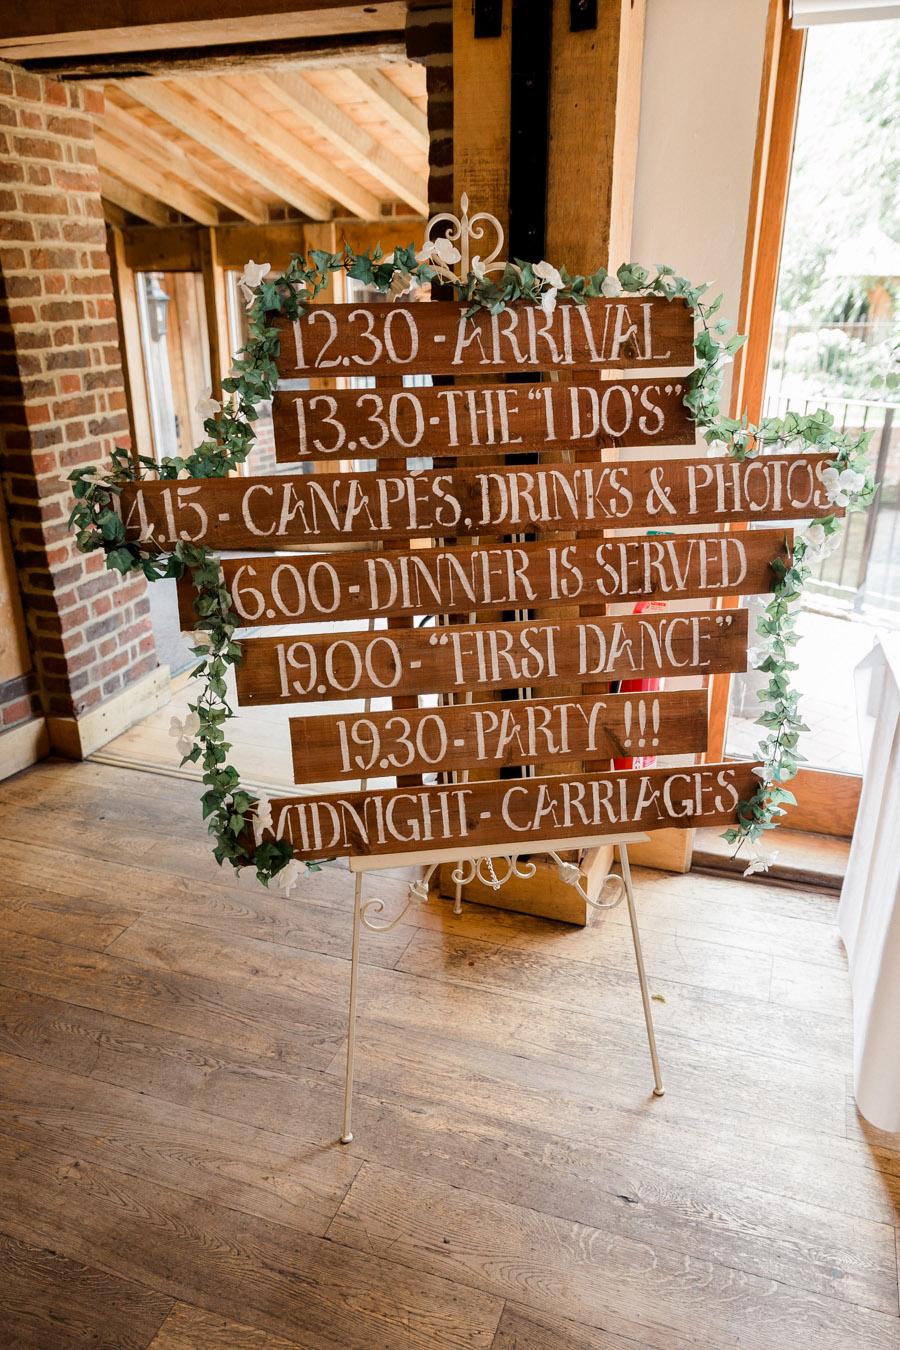 Tewin Bury farm wedding blog, photo credit Absolute Photo UK (2)